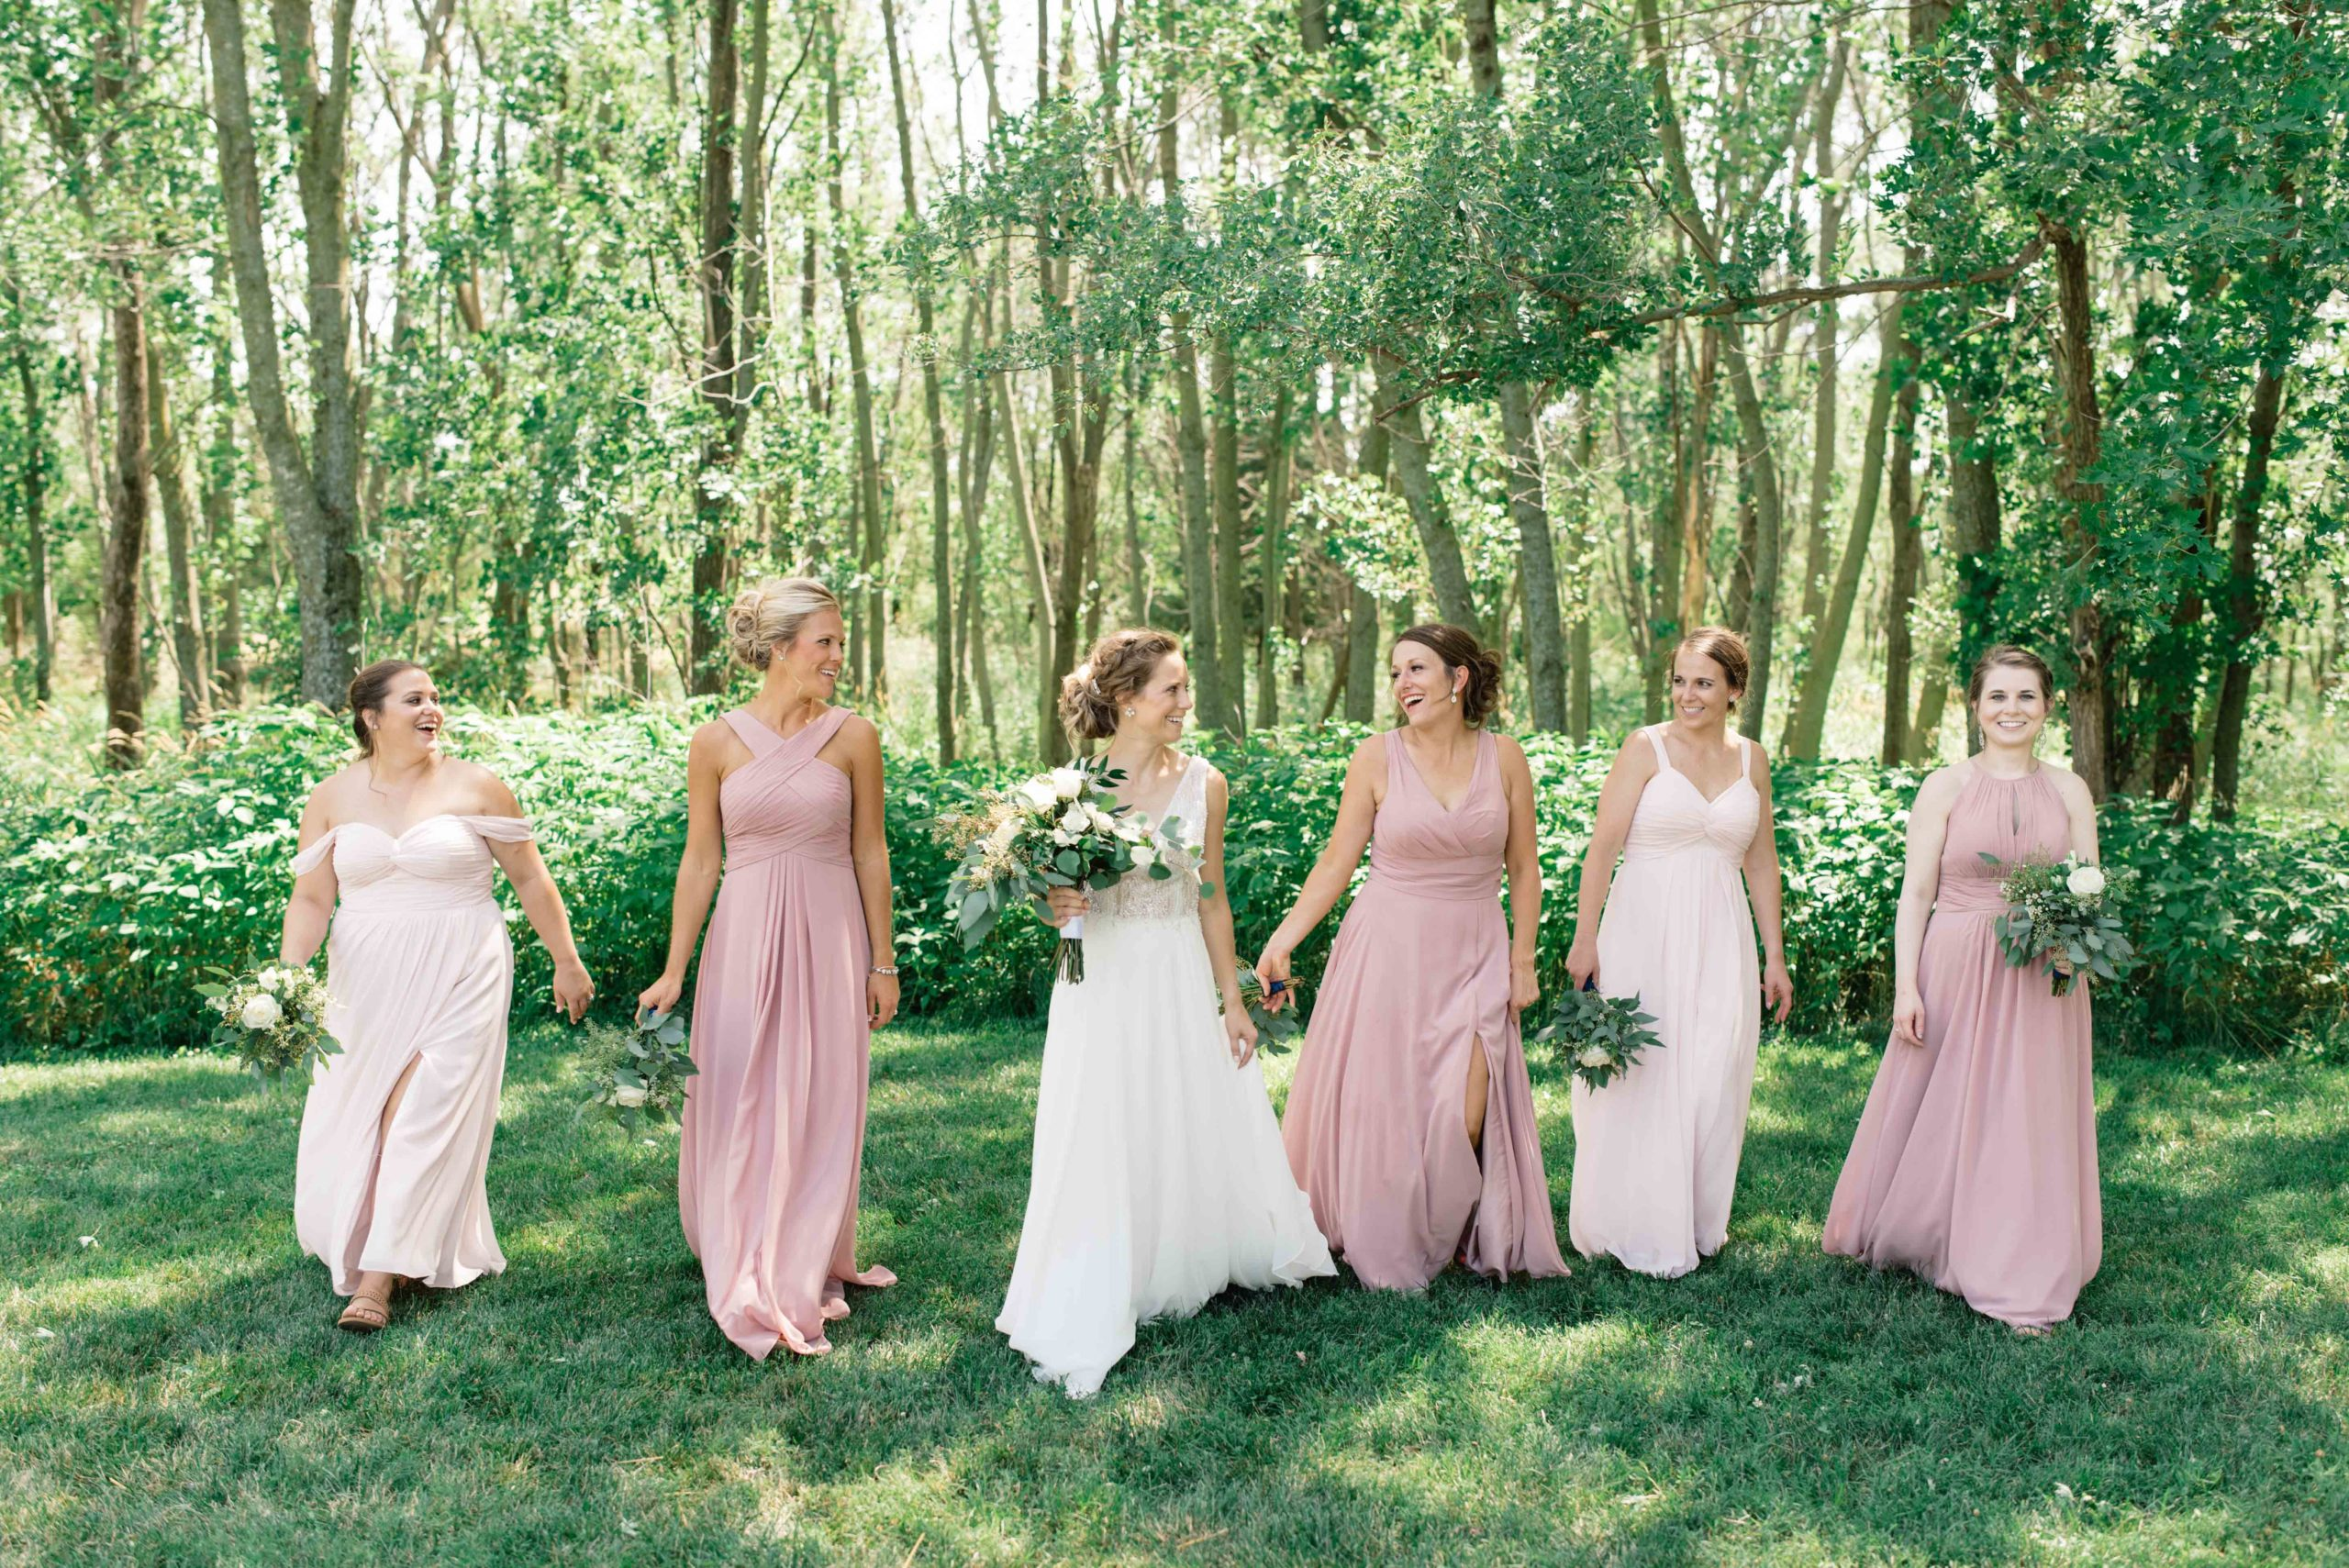 bridesmaid in blush pink dresses walking in forest schafer century barn wedding venue